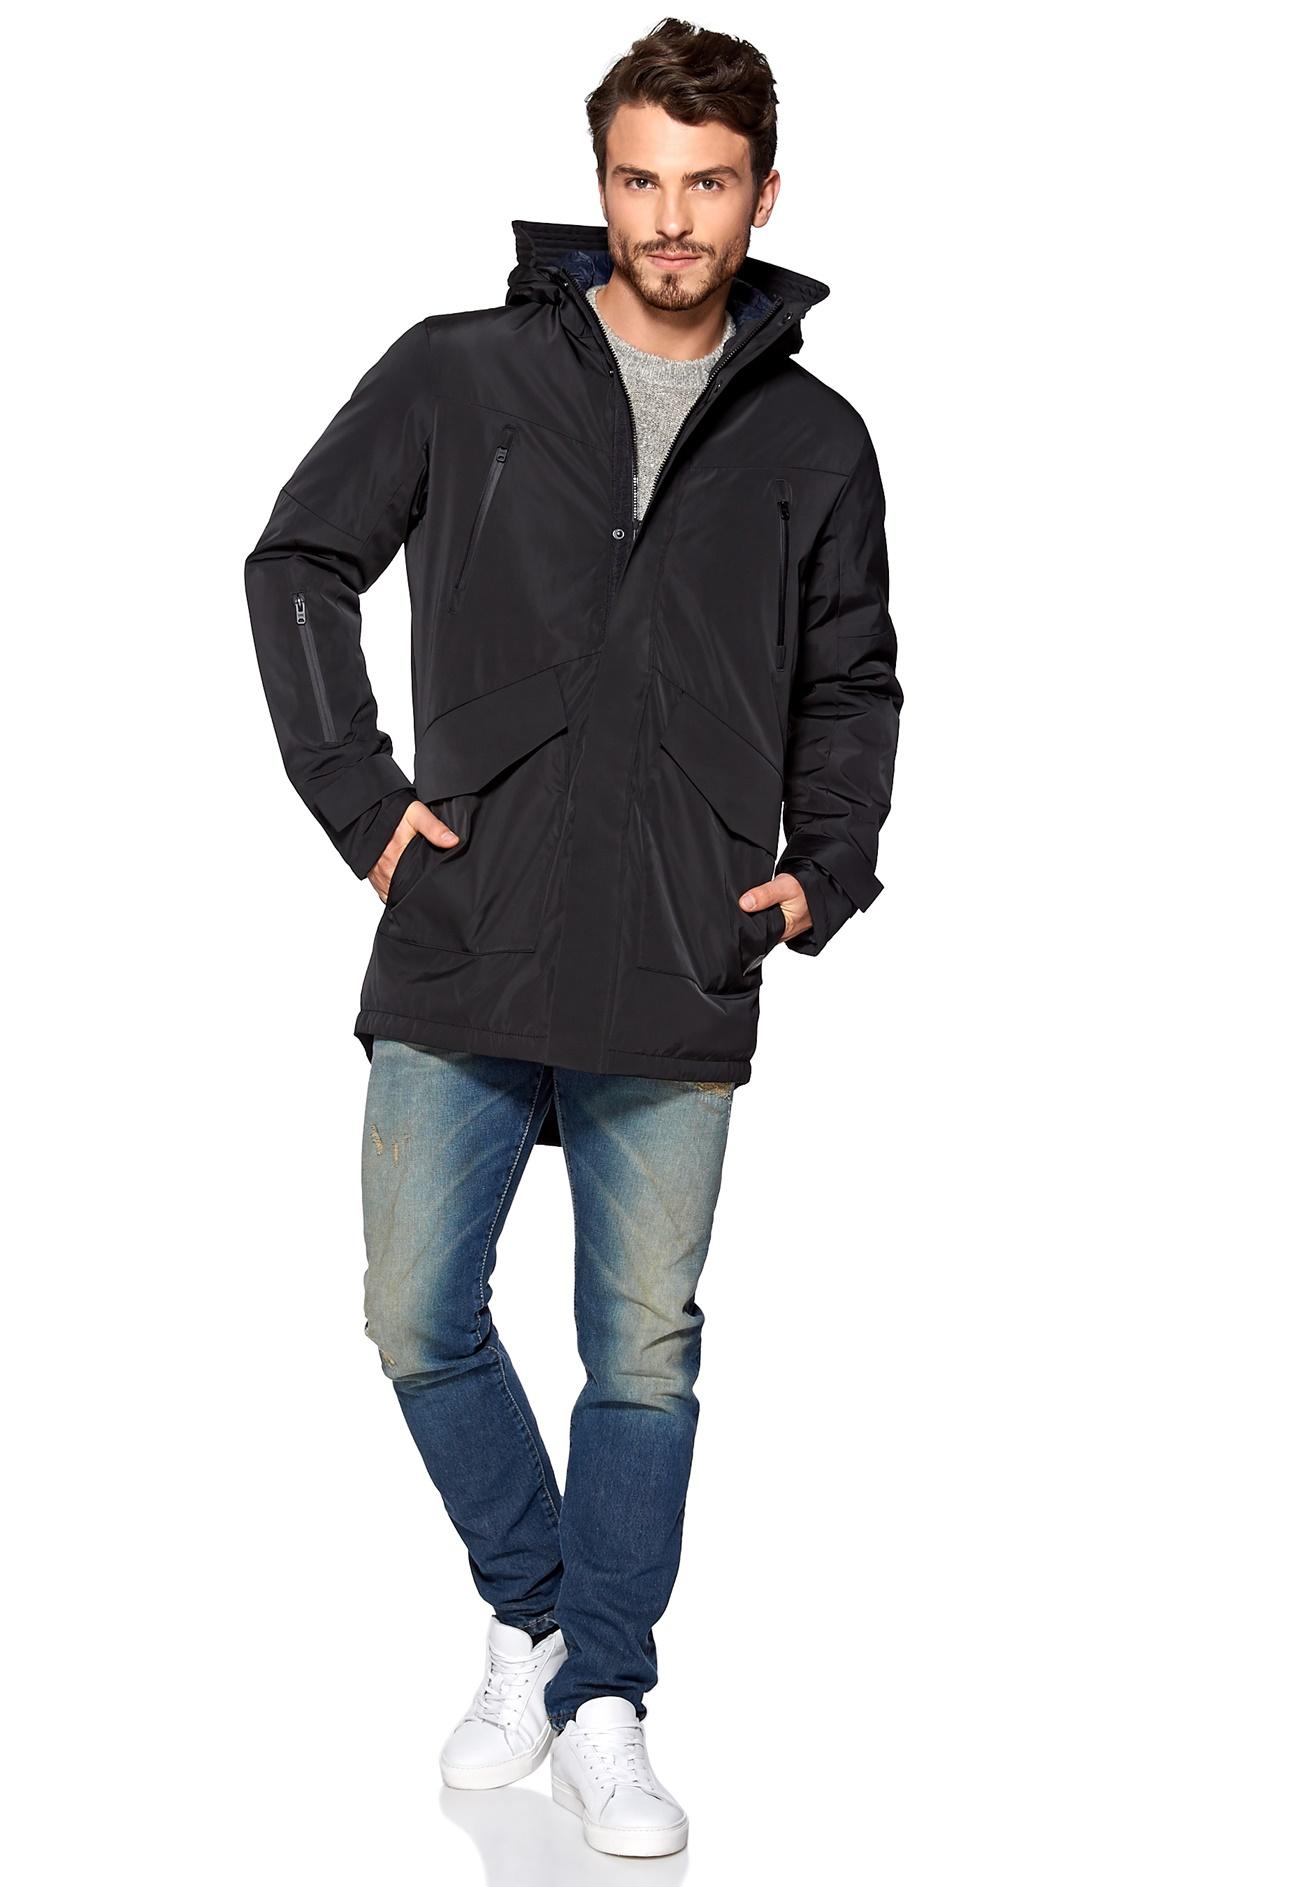 jack jones marcus parka jackets coats jackets. Black Bedroom Furniture Sets. Home Design Ideas